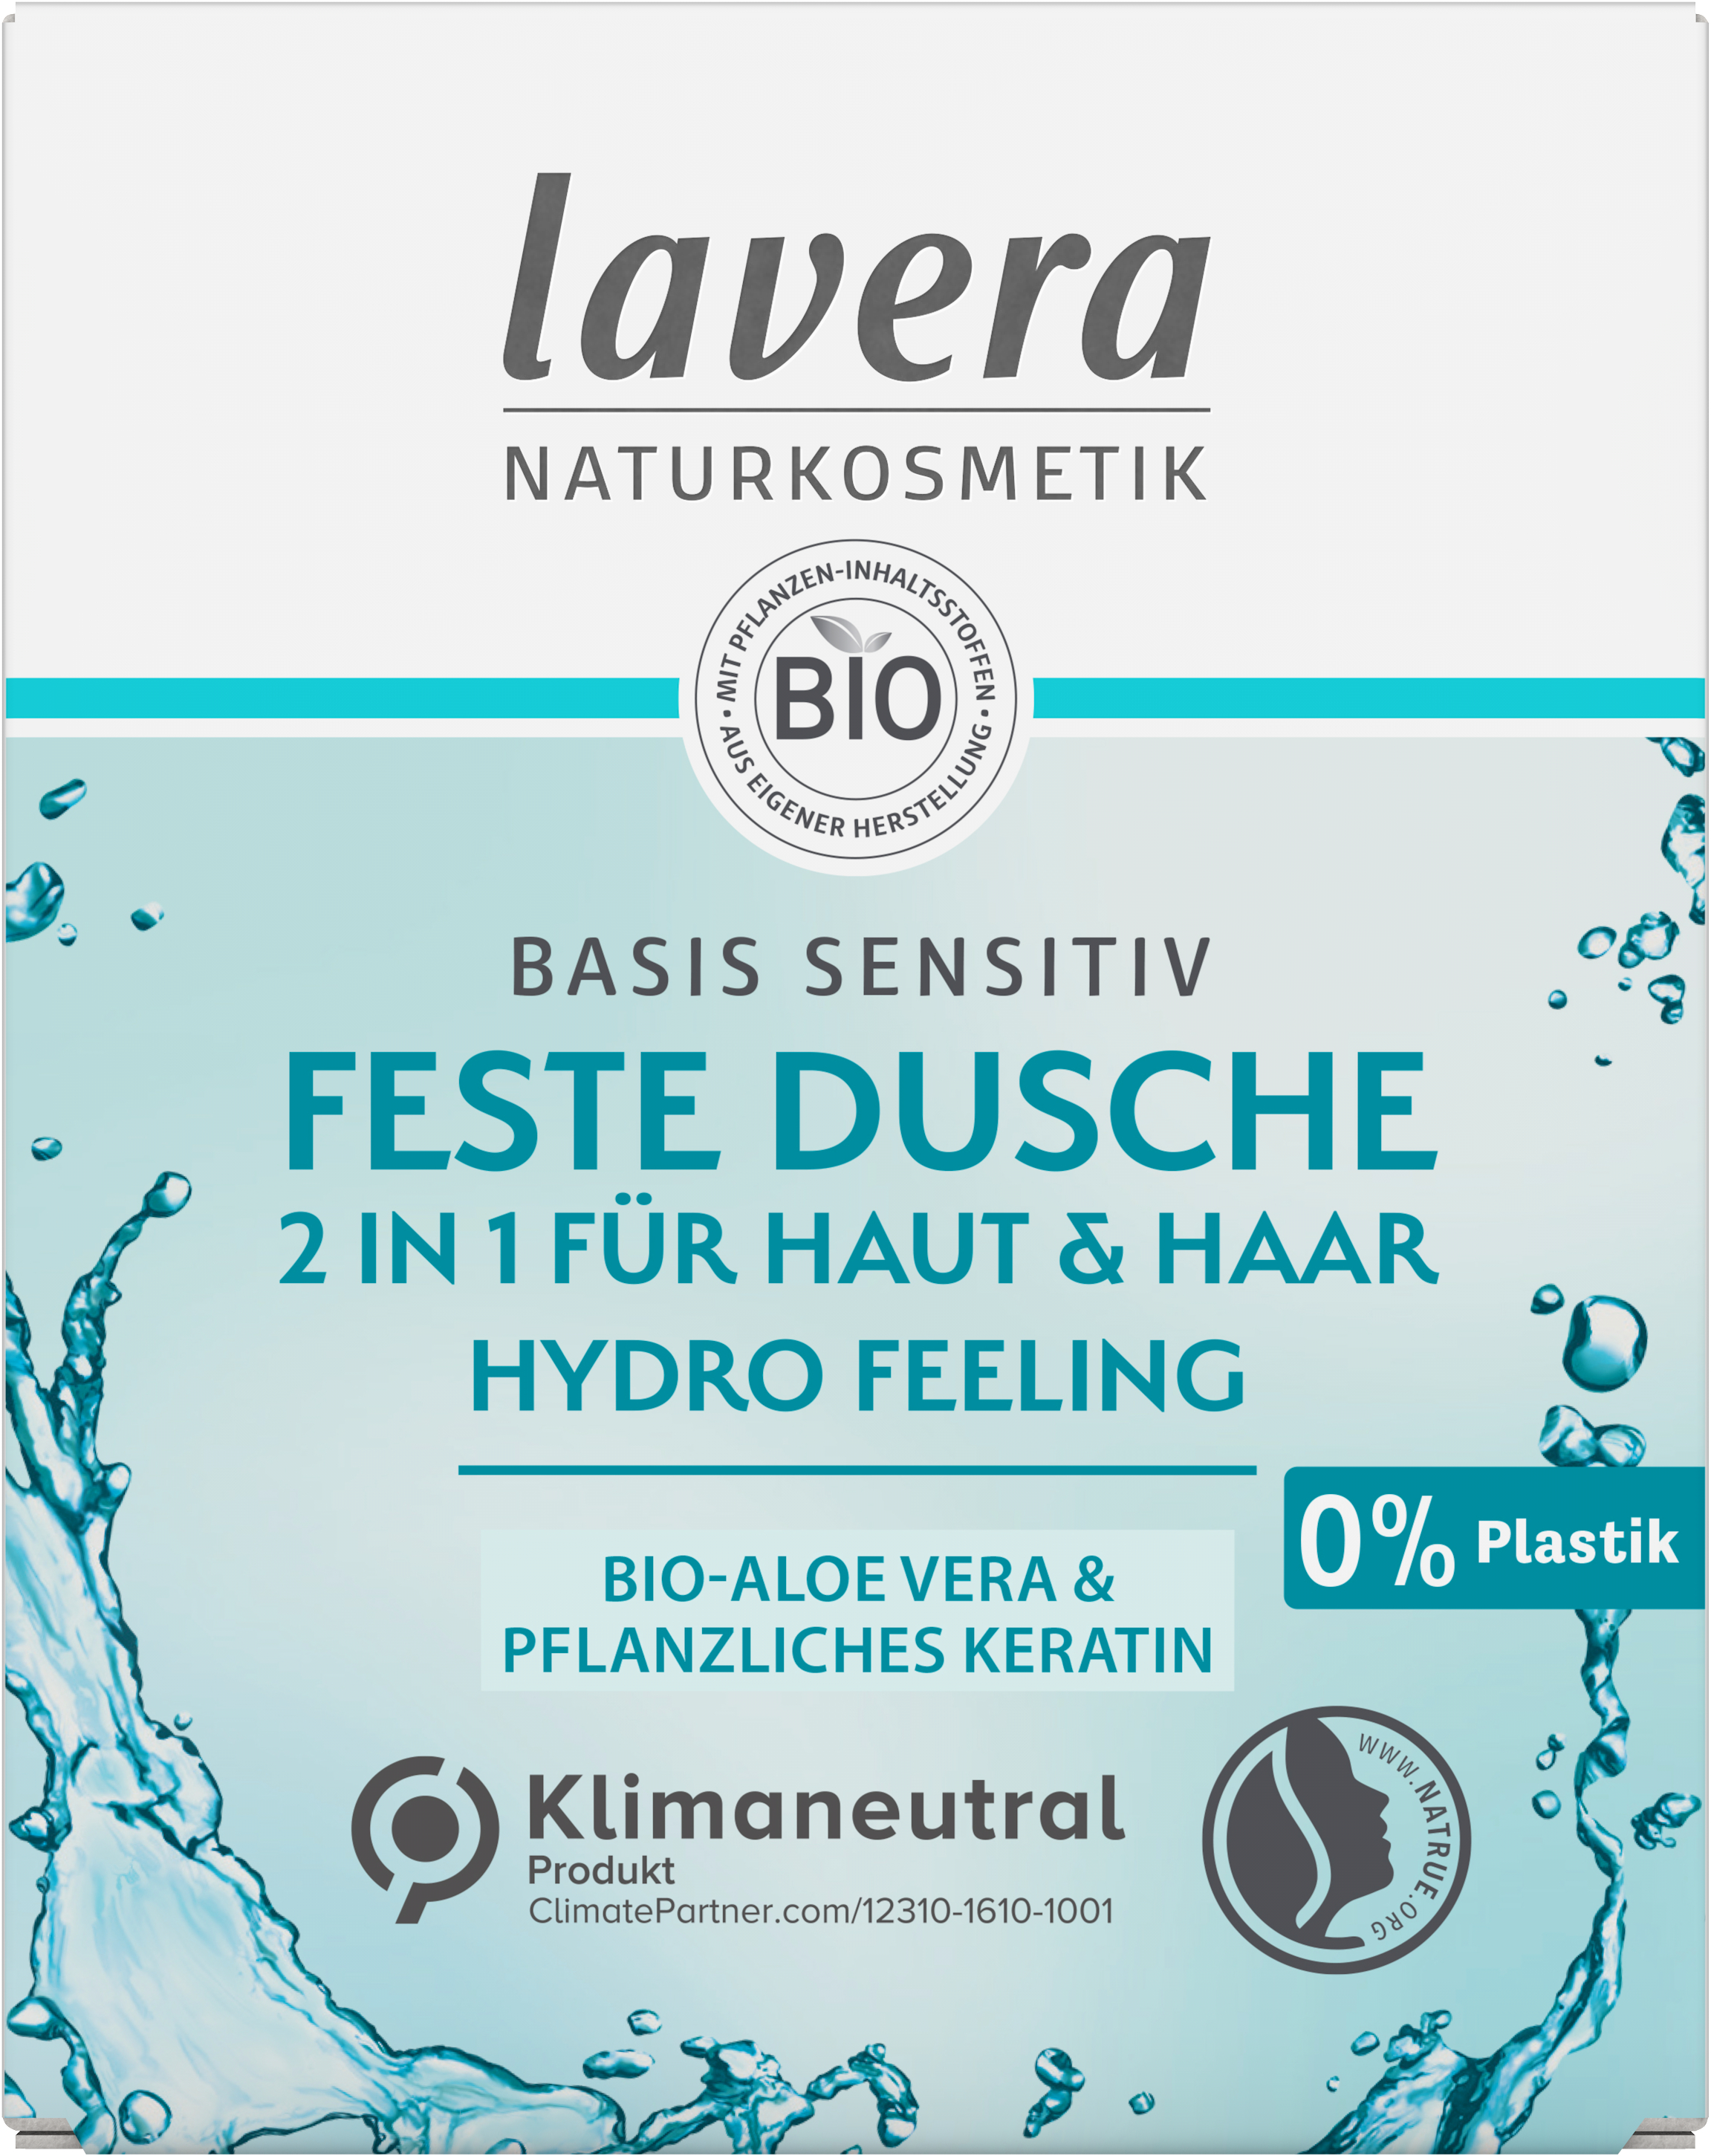 Feste Dusche 2 in 1 basis sensitiv Hydro Feeling